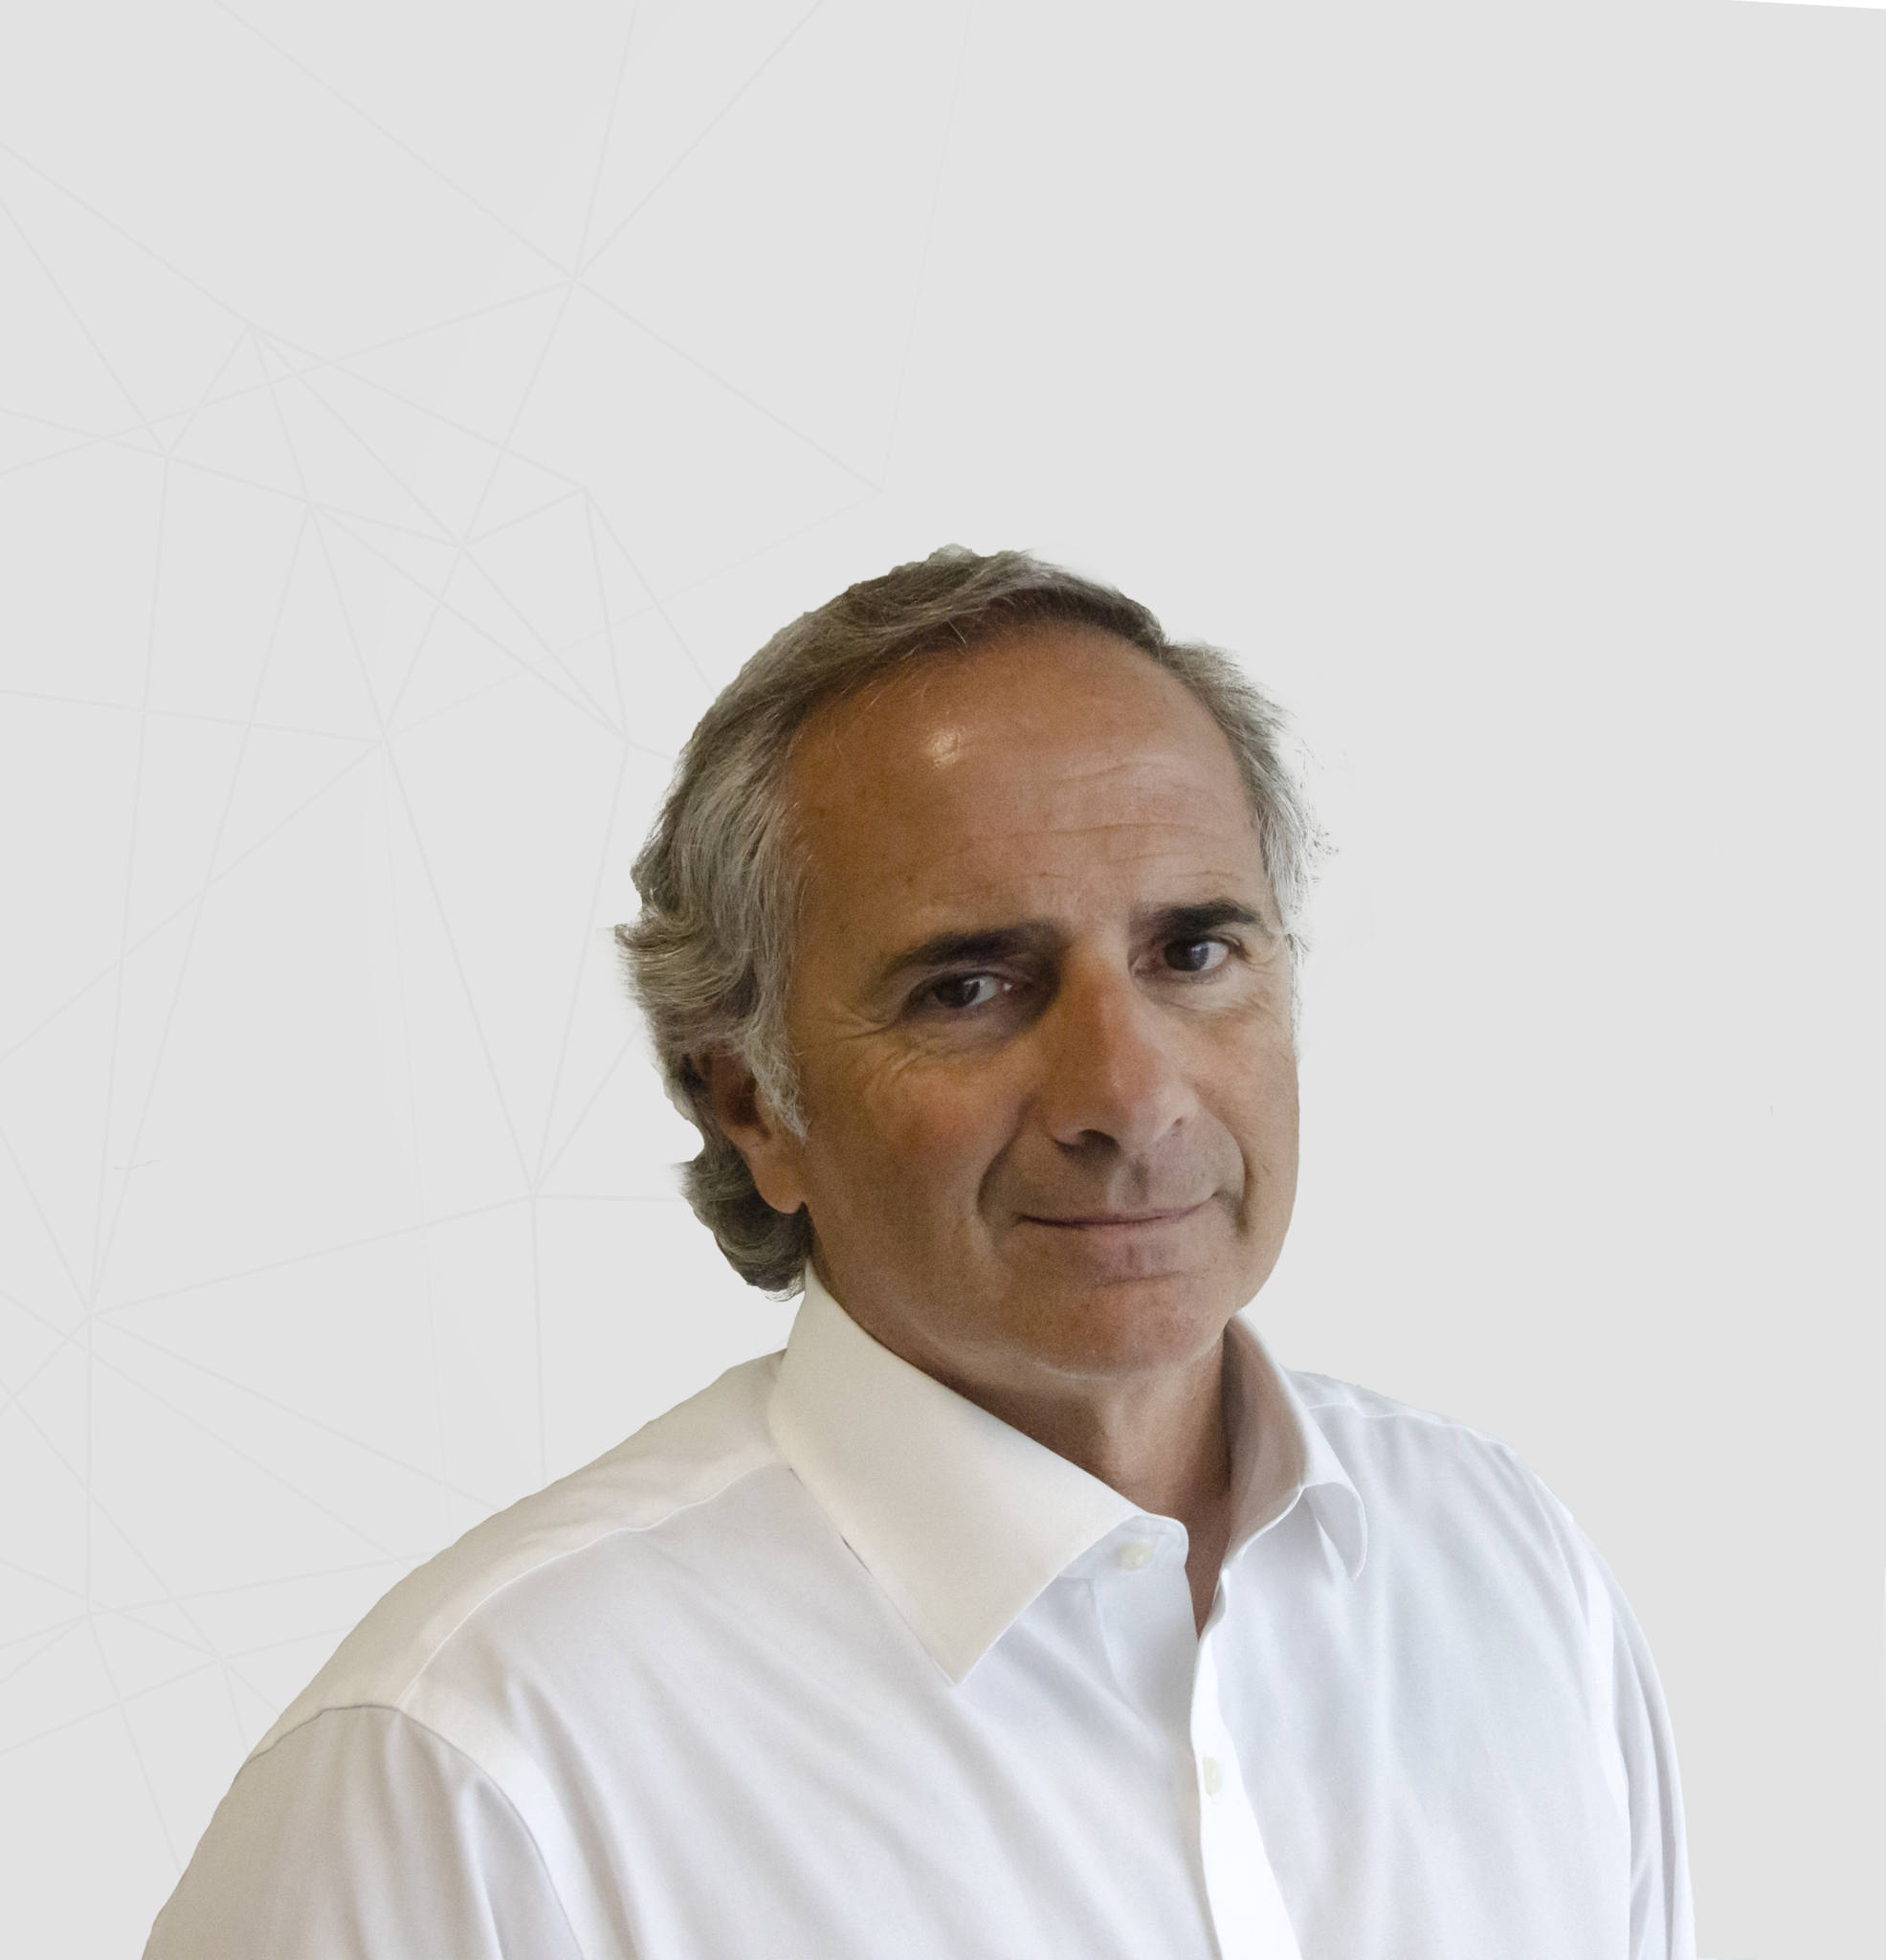 Íñigo J. Losada